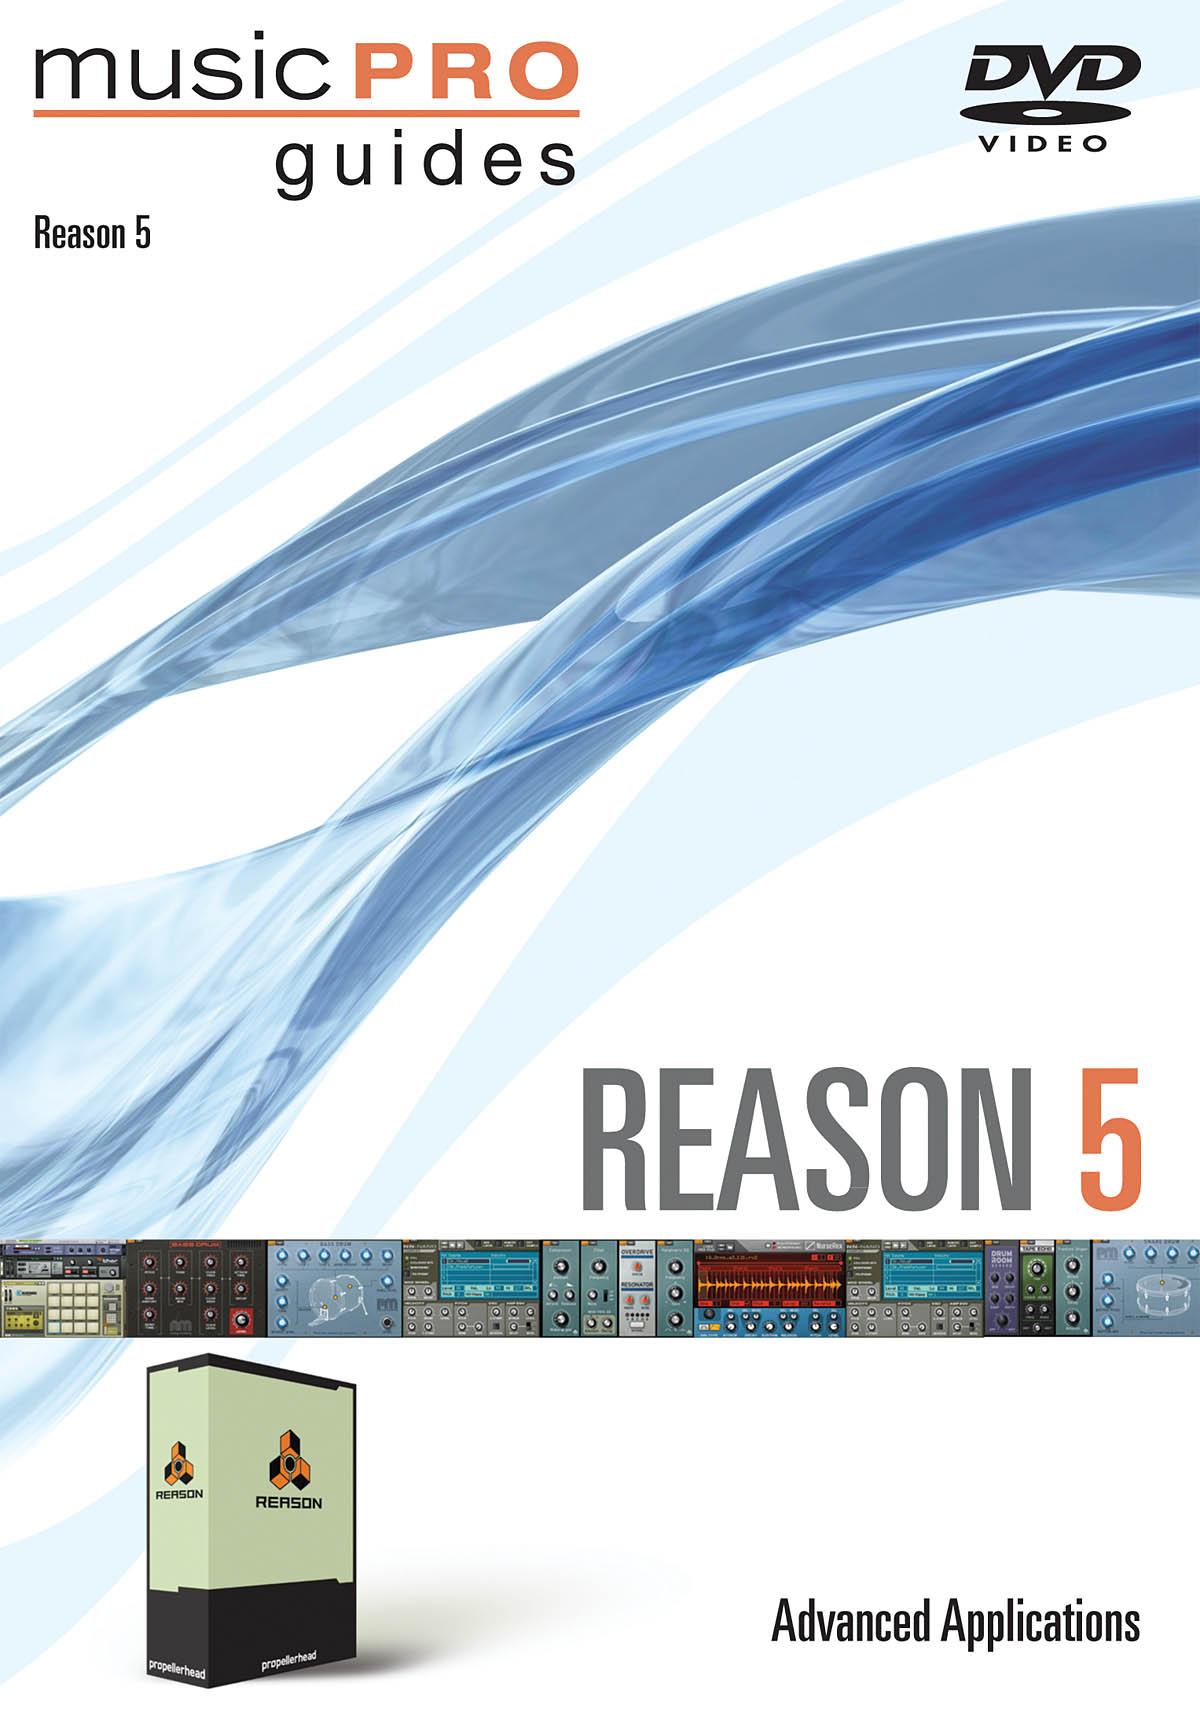 Reason 5: DVD